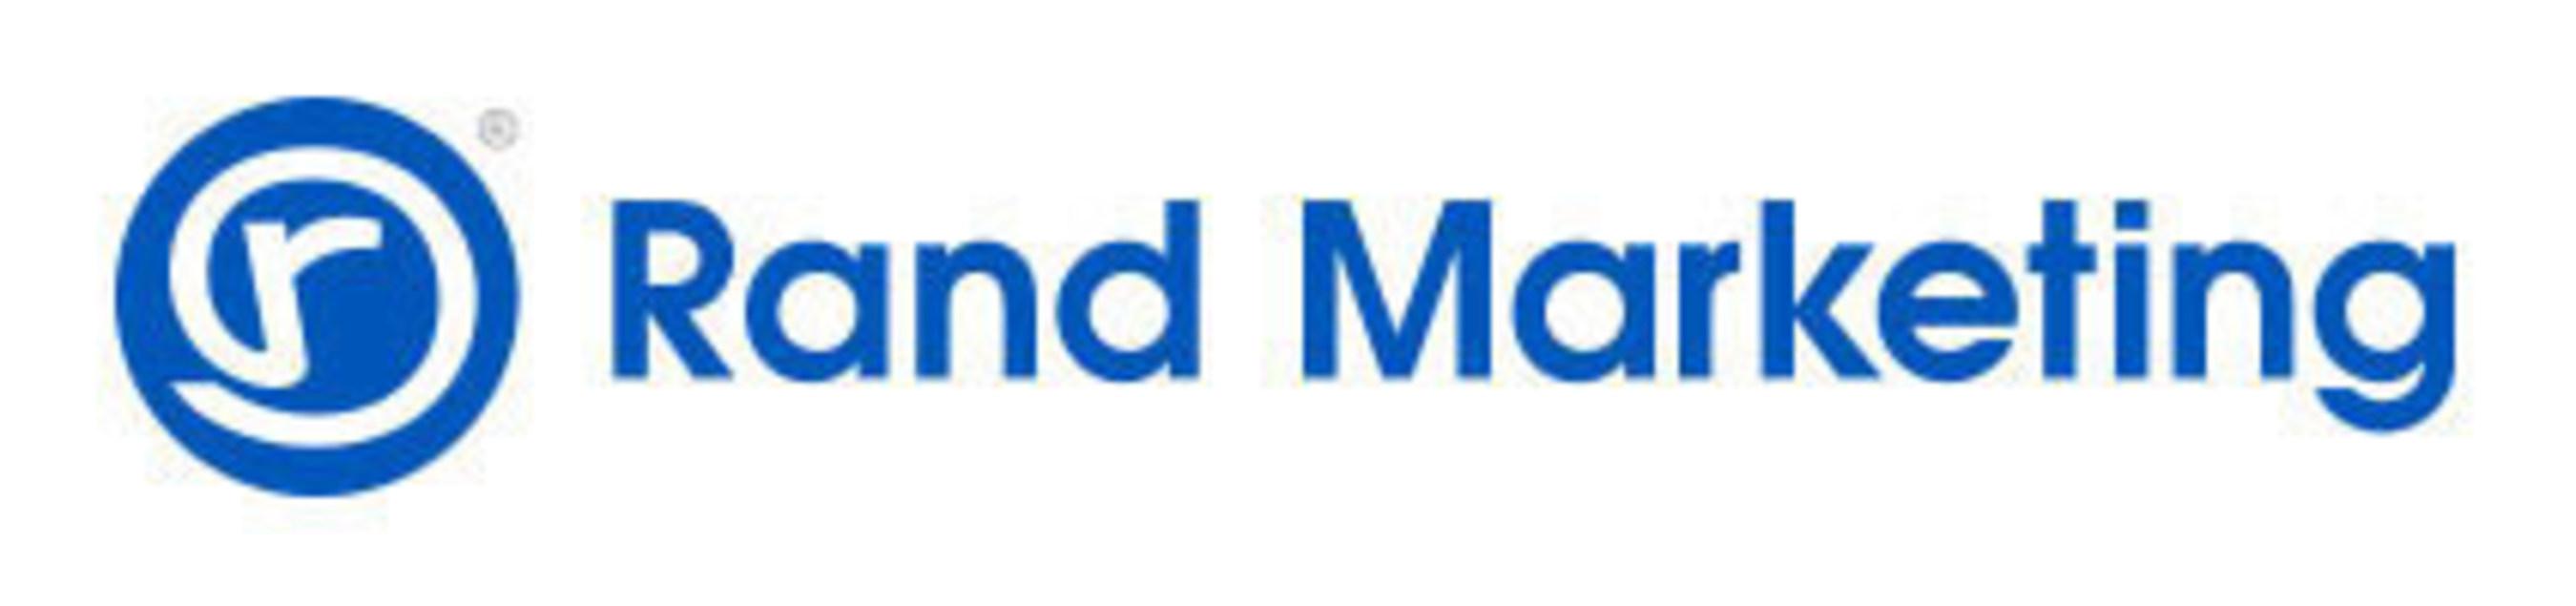 Rand Internet Marketing Announces Web Design Scholarship Winner